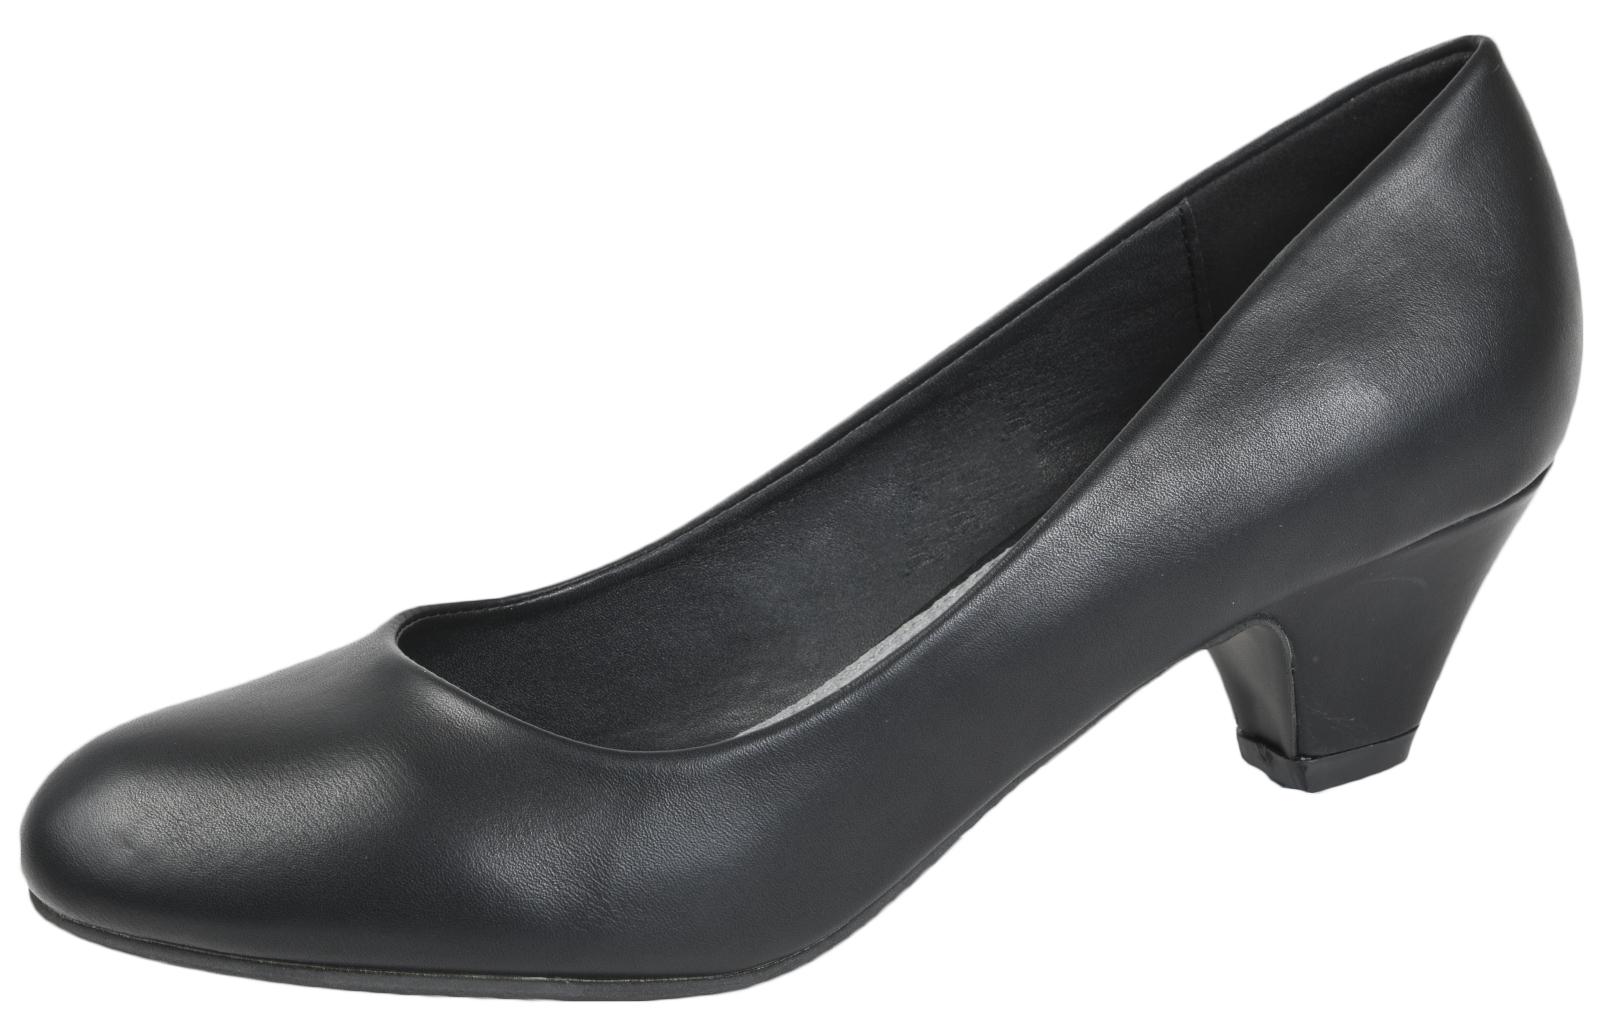 Ladies-Leather-Lined-Low-Block-Heels-Comfort-Work-Office-Court-Shoes-Ladies-Size miniatuur 24